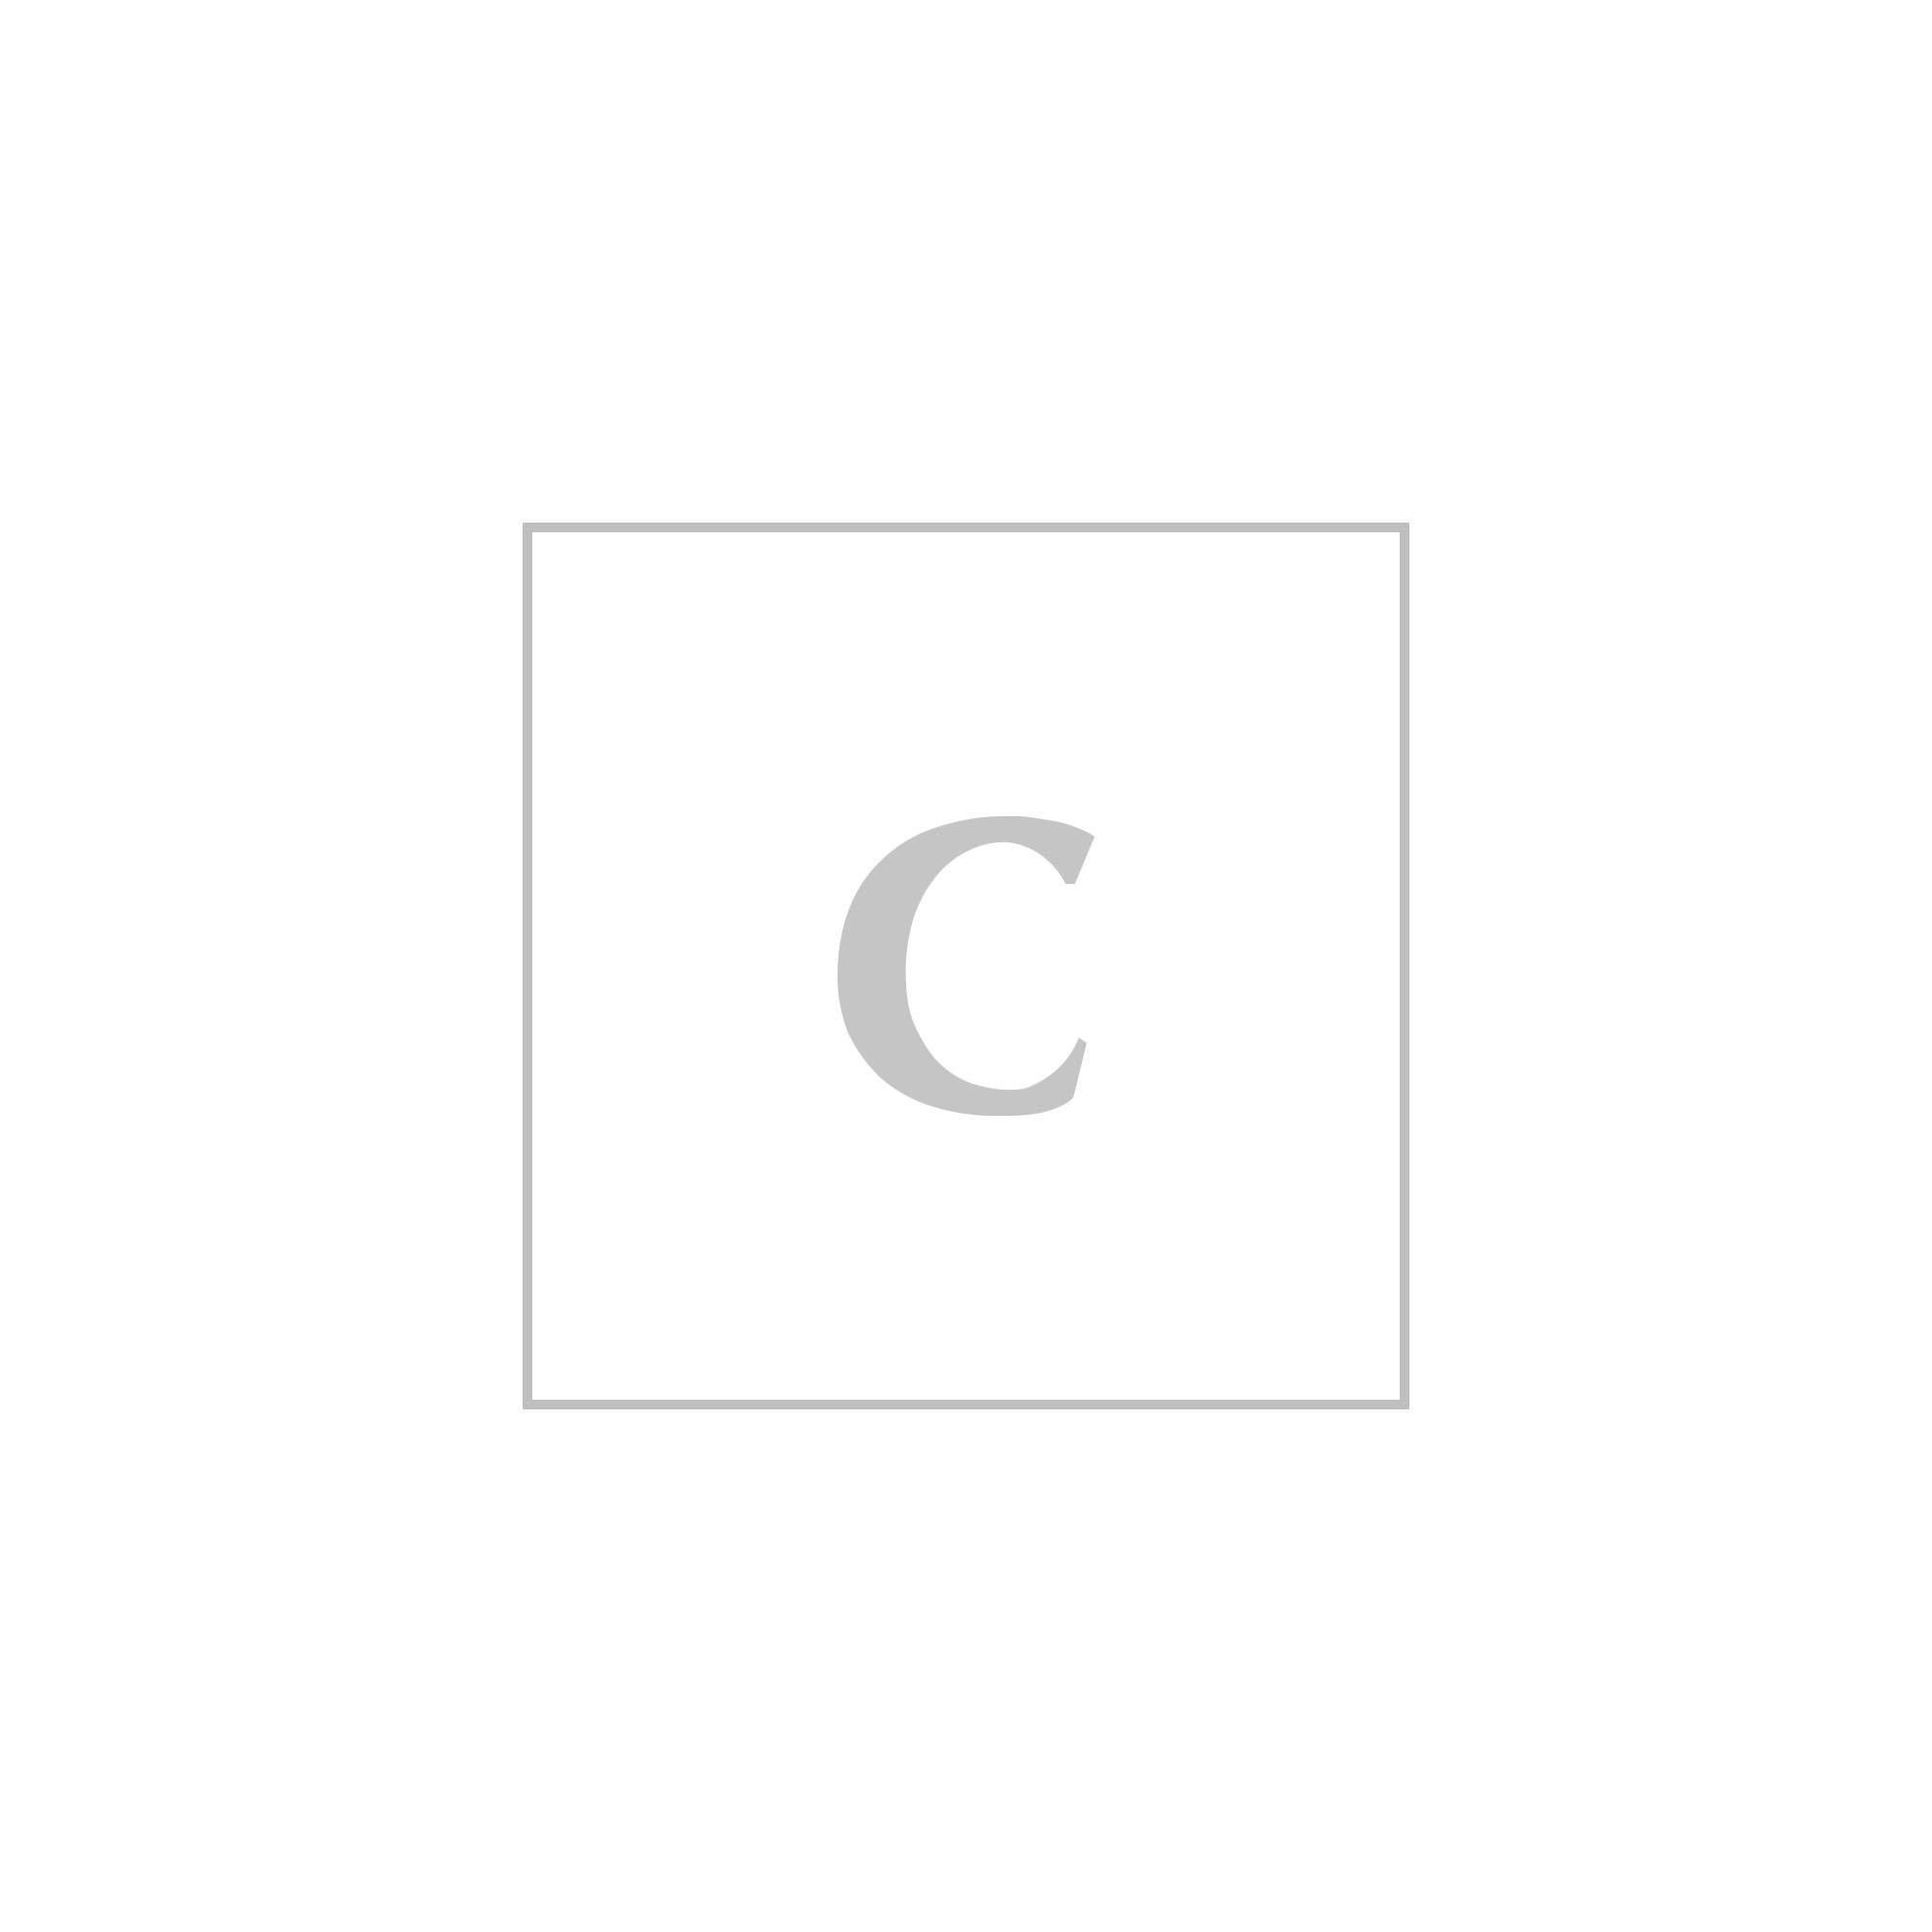 Saint laurent ysl pochette c.wall monogramme